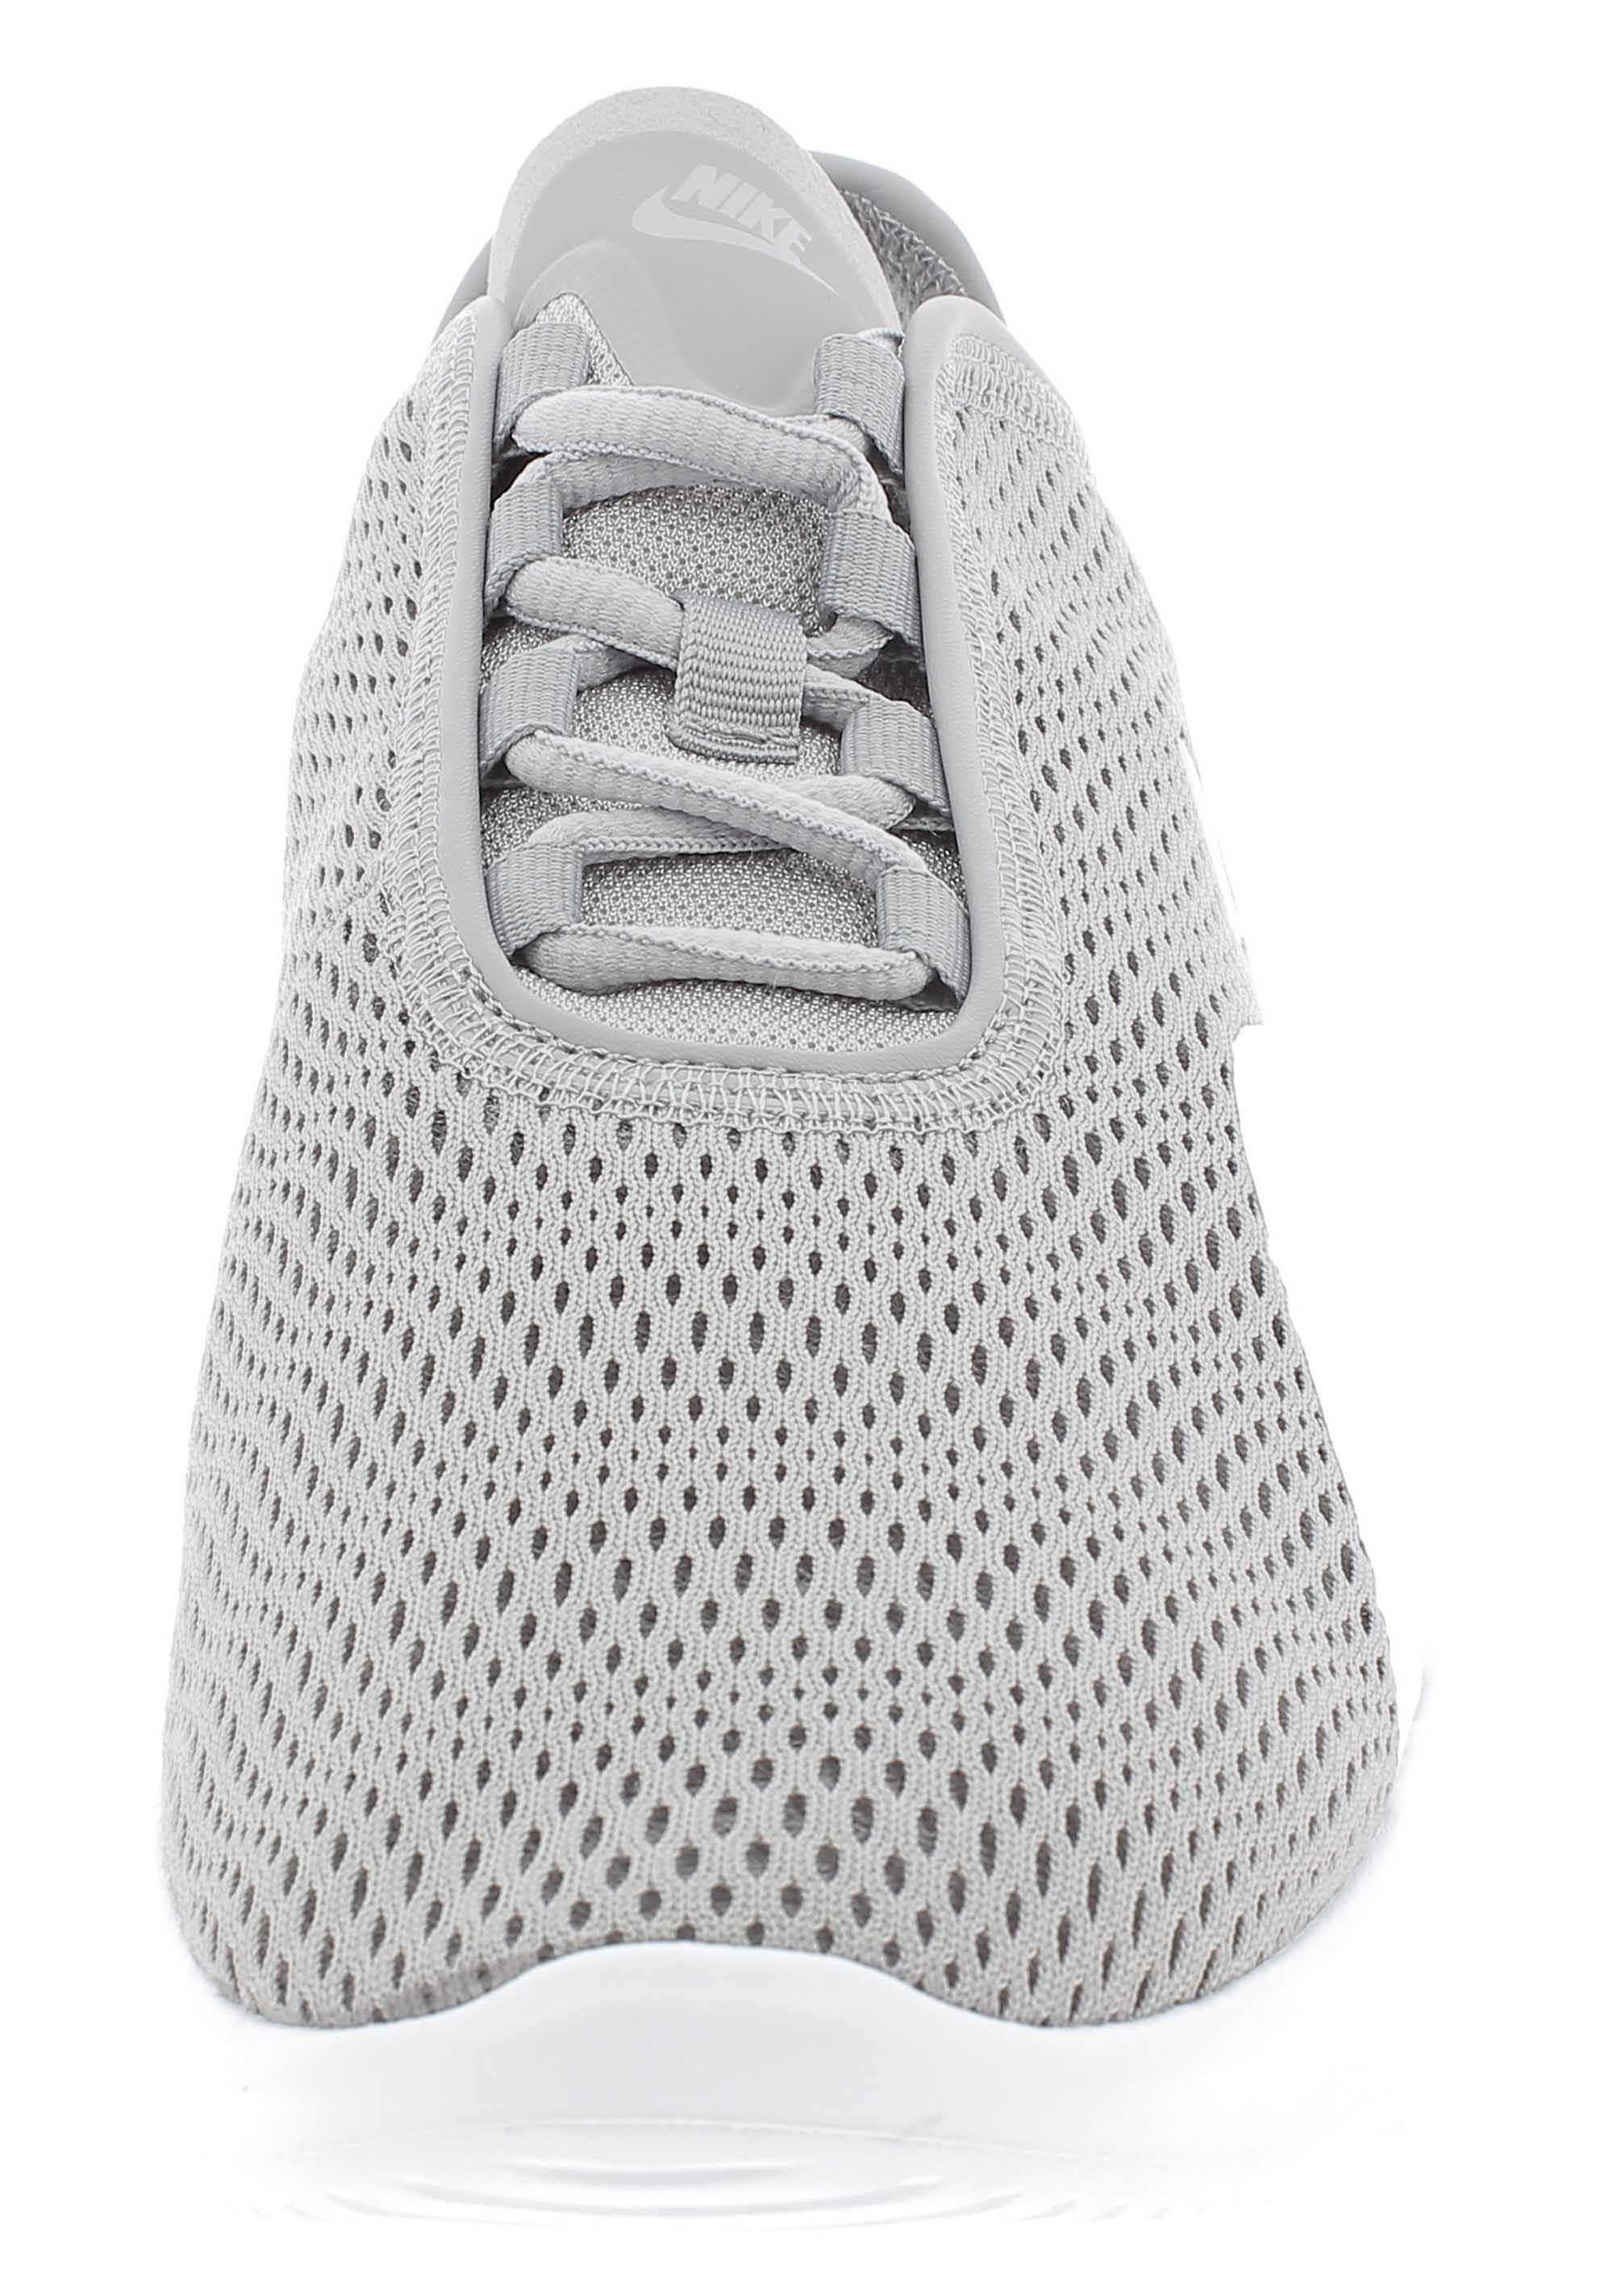 Nike De Pour 2 Gris Homme Max Air Ao0266002 Chaussures Motion Sport rqY8rw